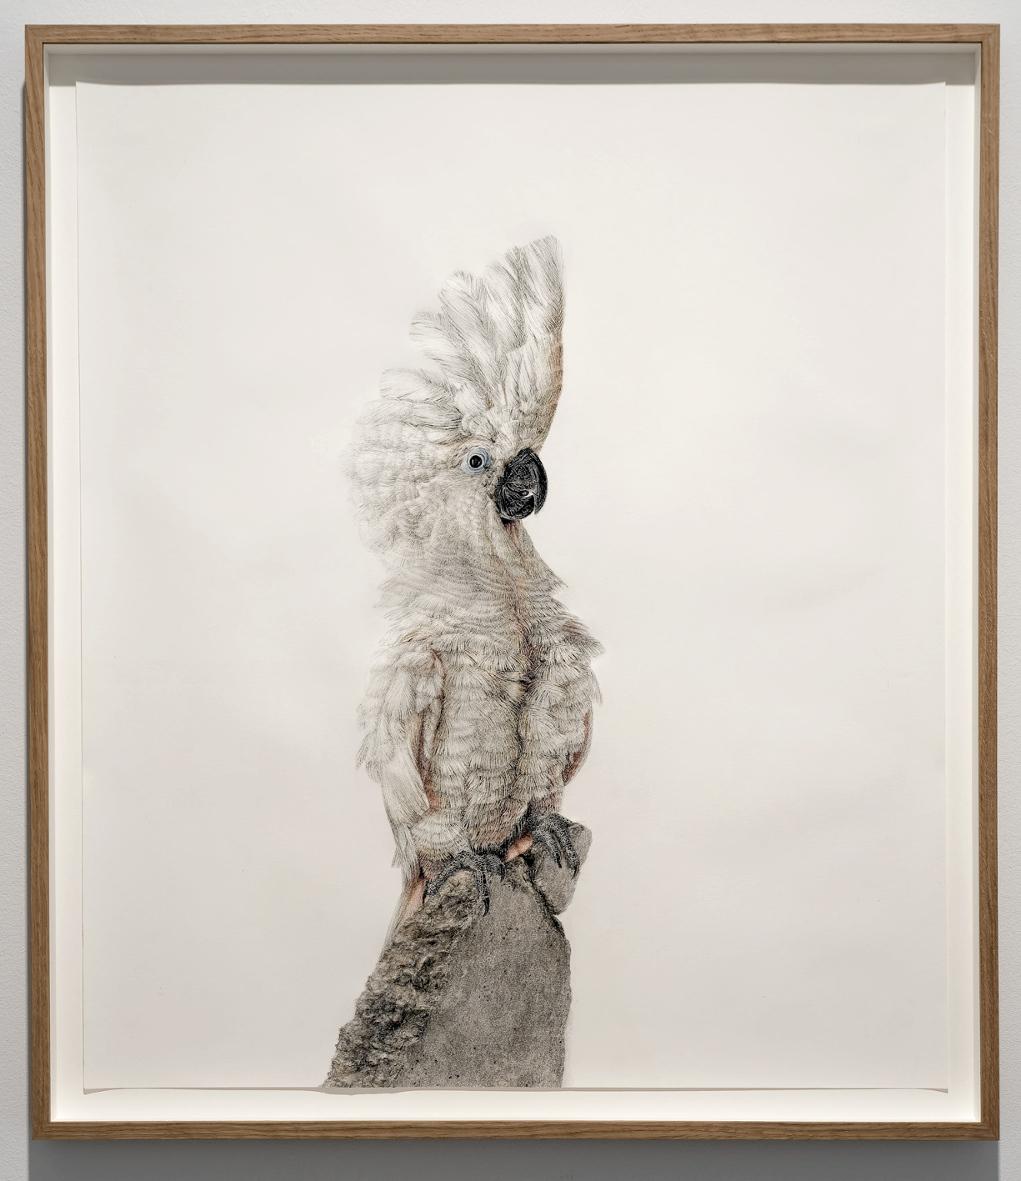 Schroedinger´s Bird 1 - Chalk Pastels on Paper, 68 x 79cm, 2016 - Photograph: © Andreas Baudisch, Galerie Gerken